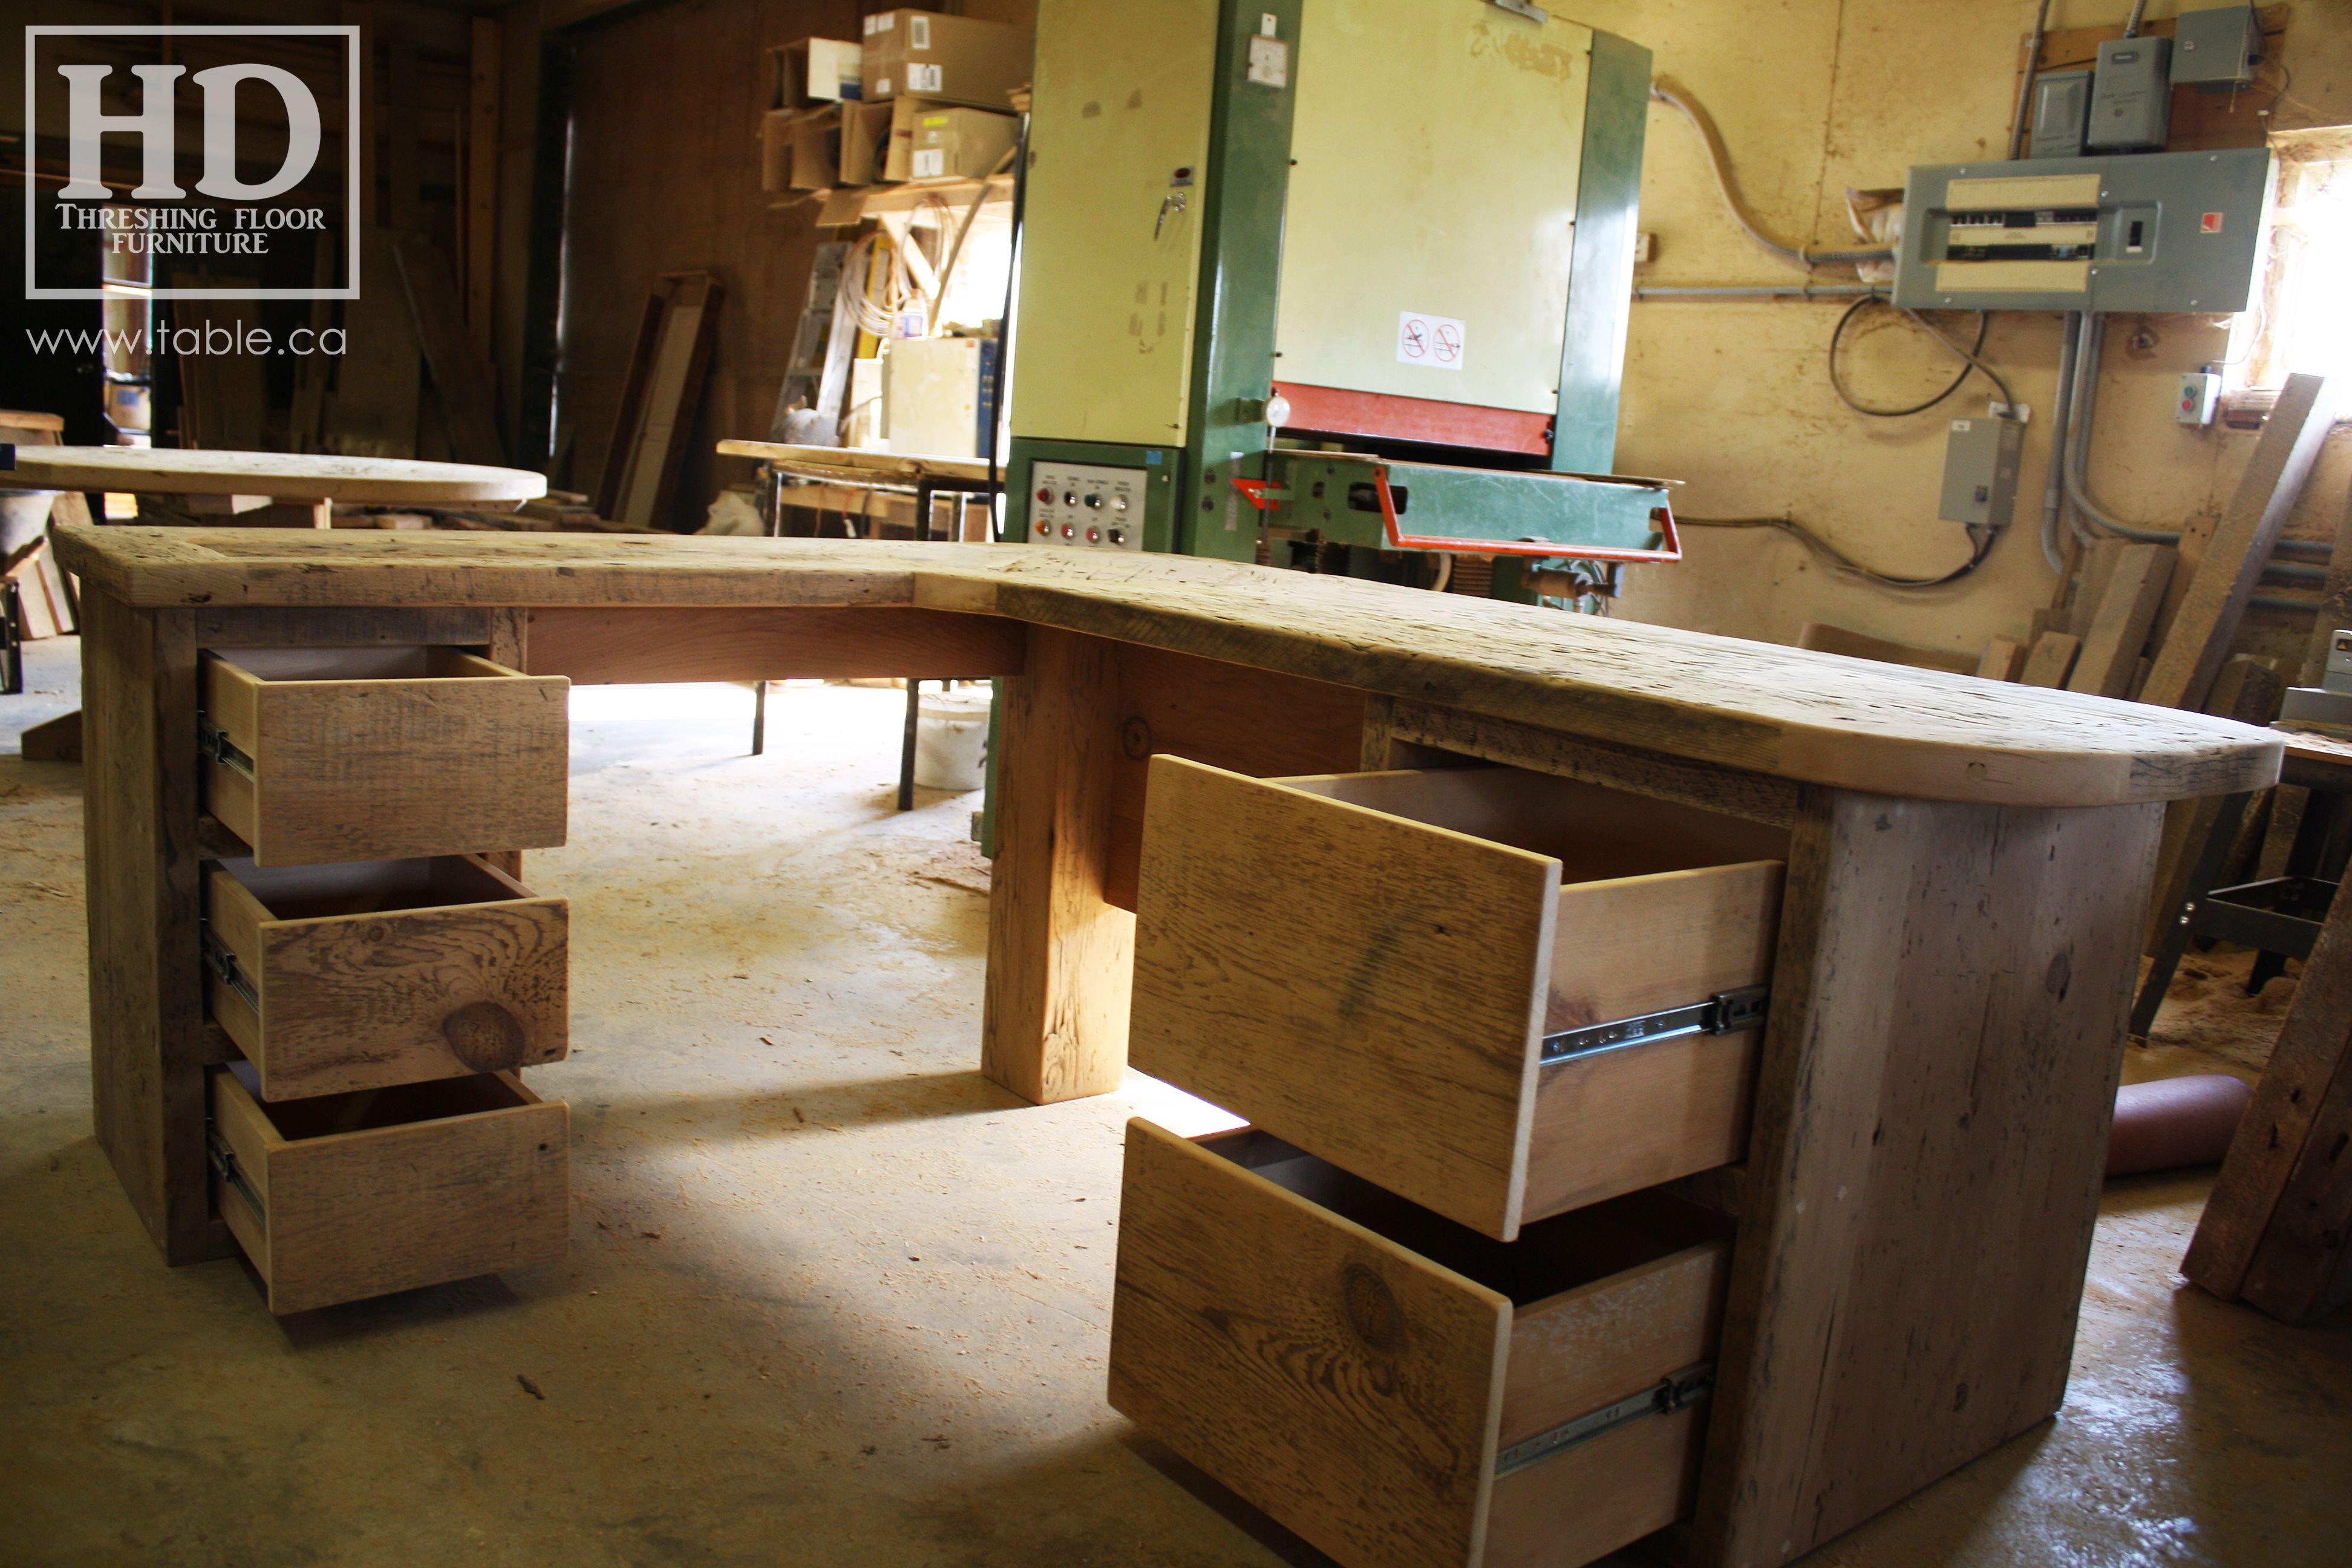 Surprising Reclaimed Wood Desk By Hd Threshing Floor Furniture Of Download Free Architecture Designs Scobabritishbridgeorg